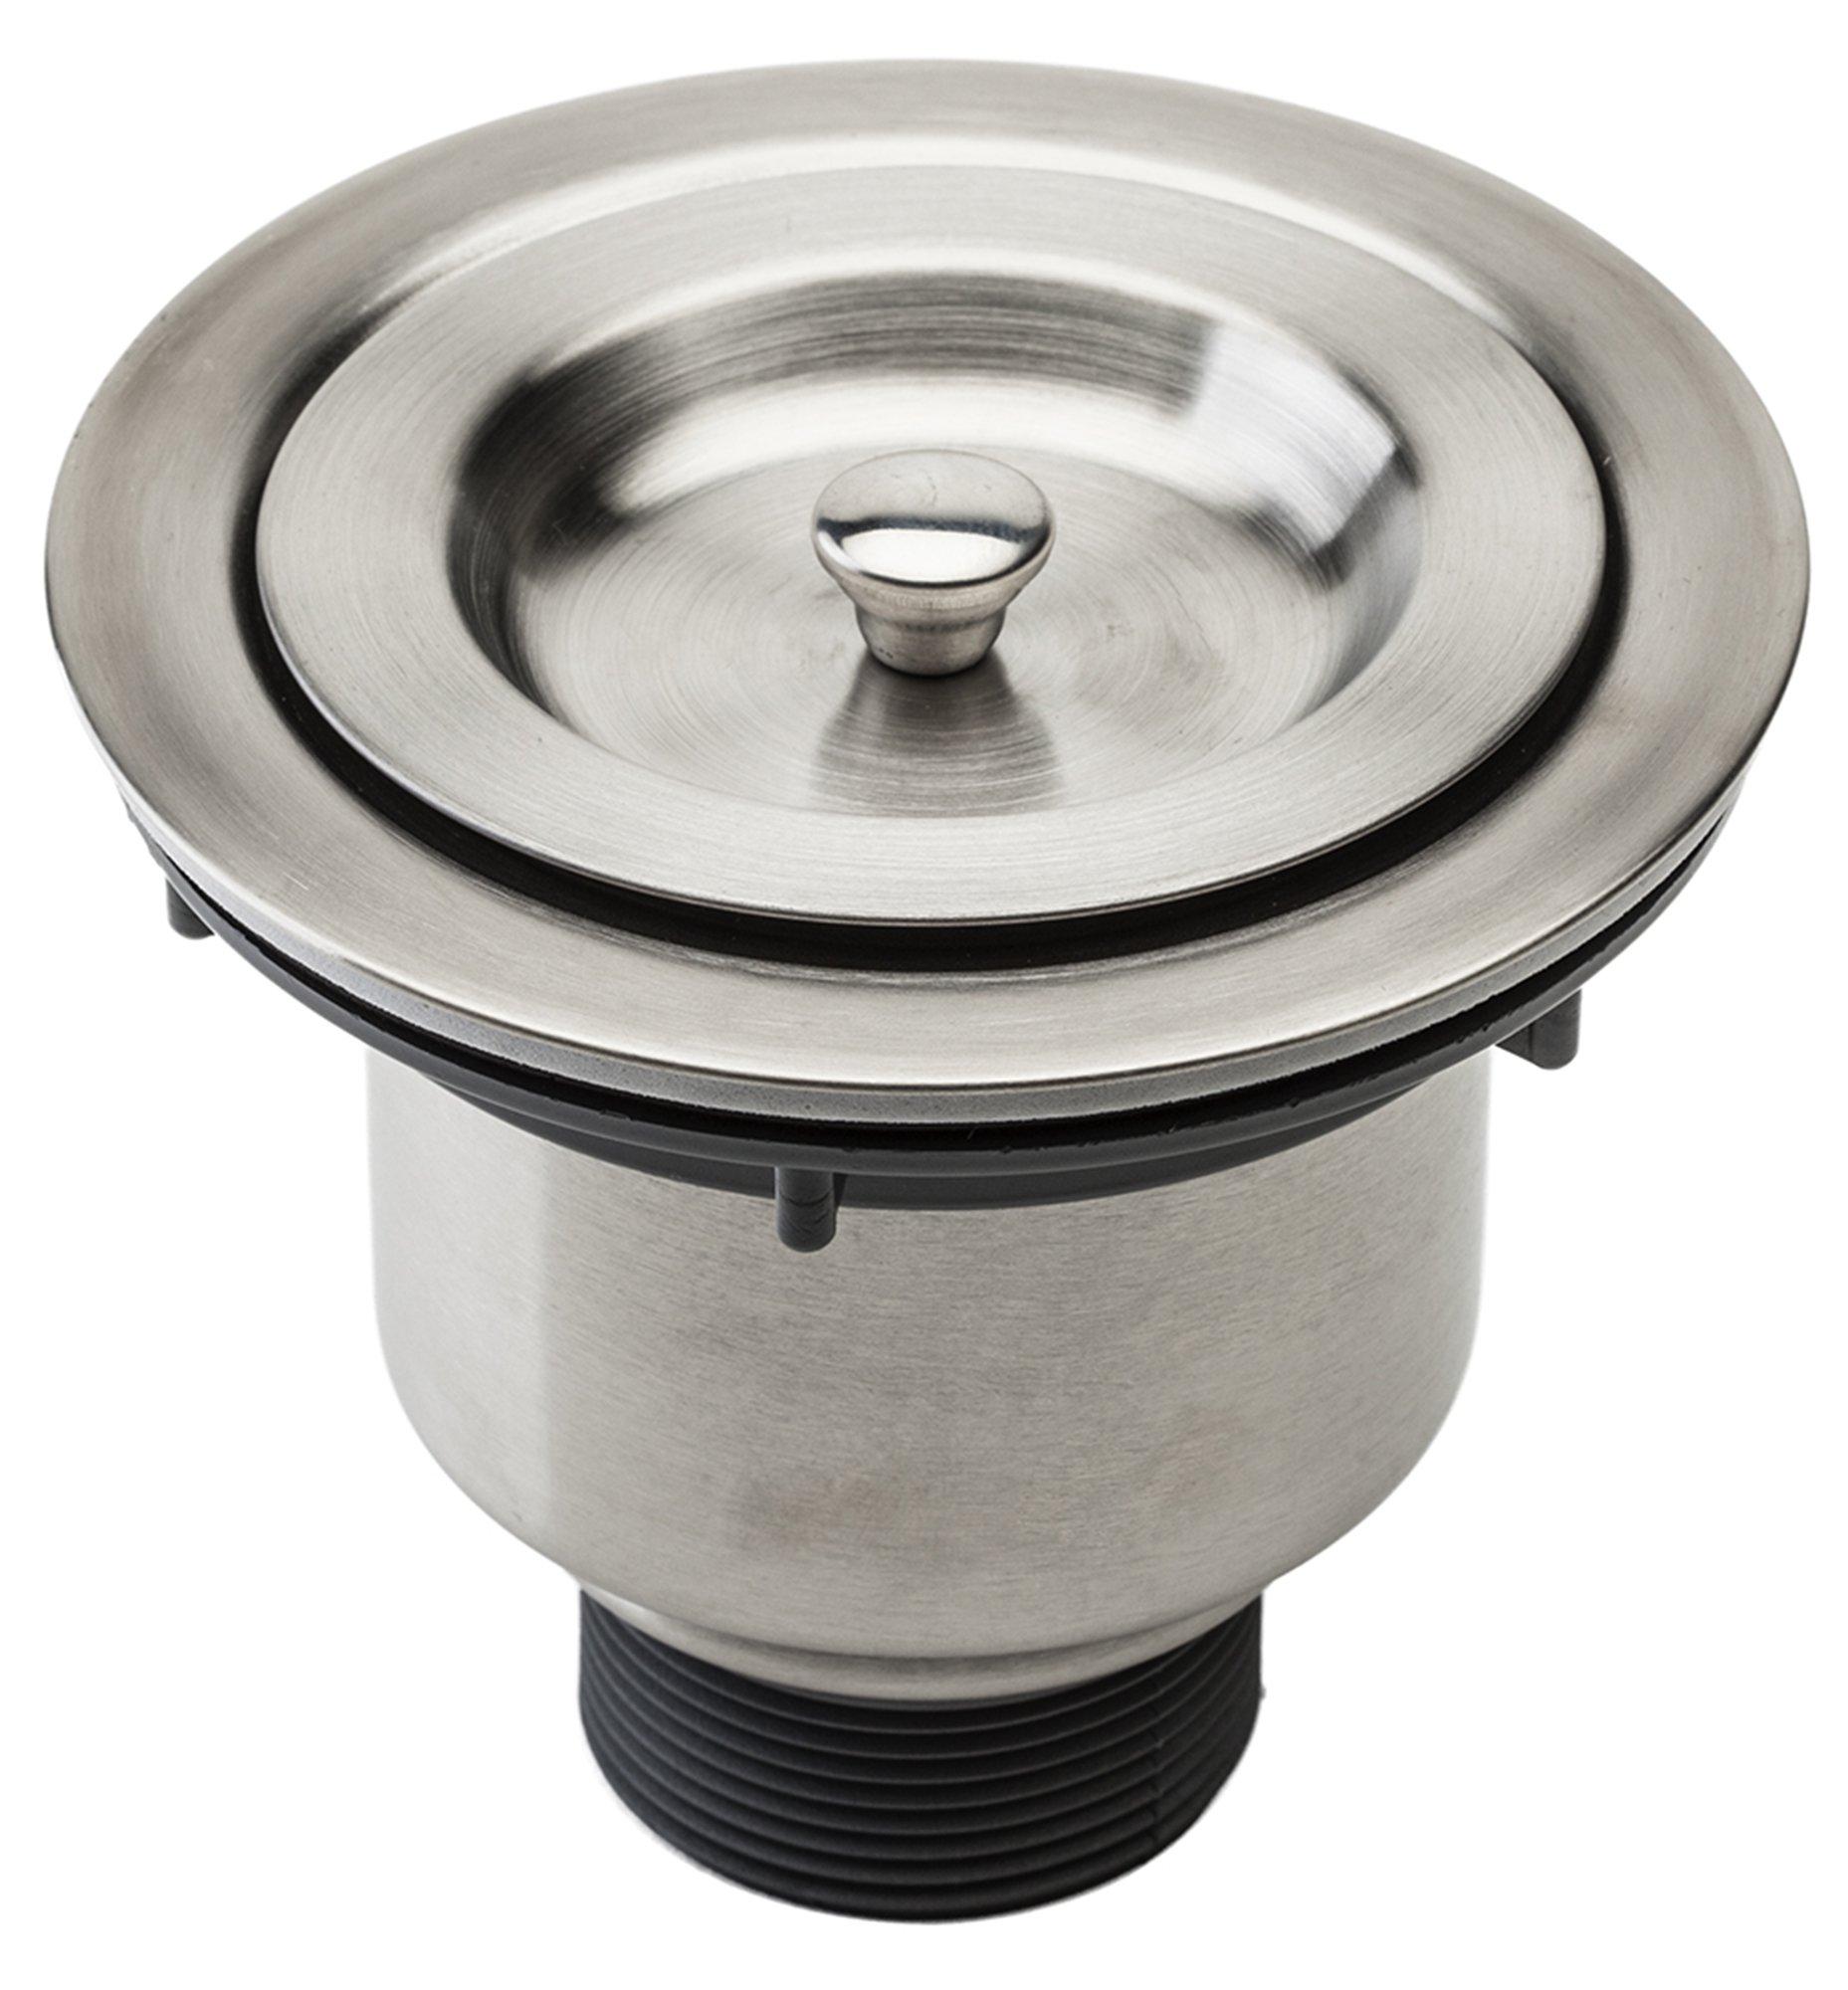 kitchen sink basket strainer island with granite top fluxe 3 5 inch stainless steel deep waste